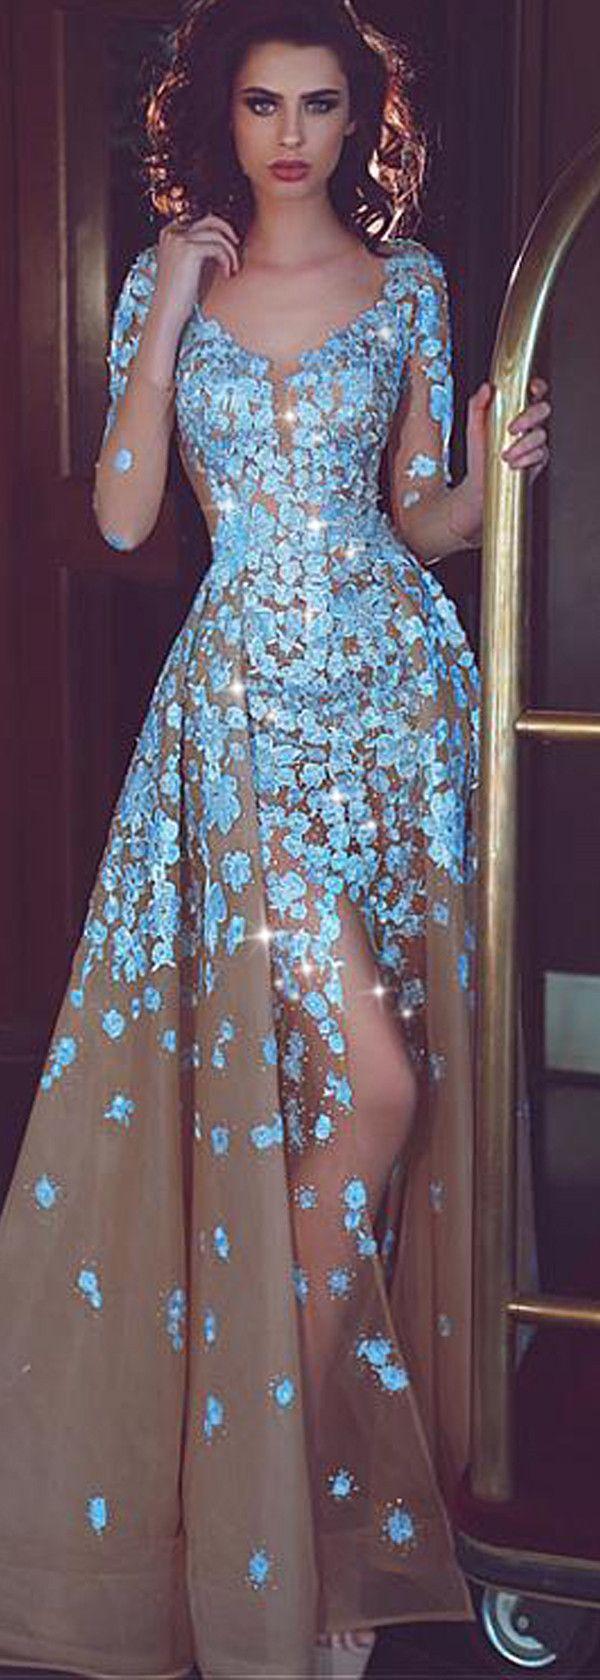 Fantastic Organza V-neck Neckline Long Sleeves A-line Prom Dress ...